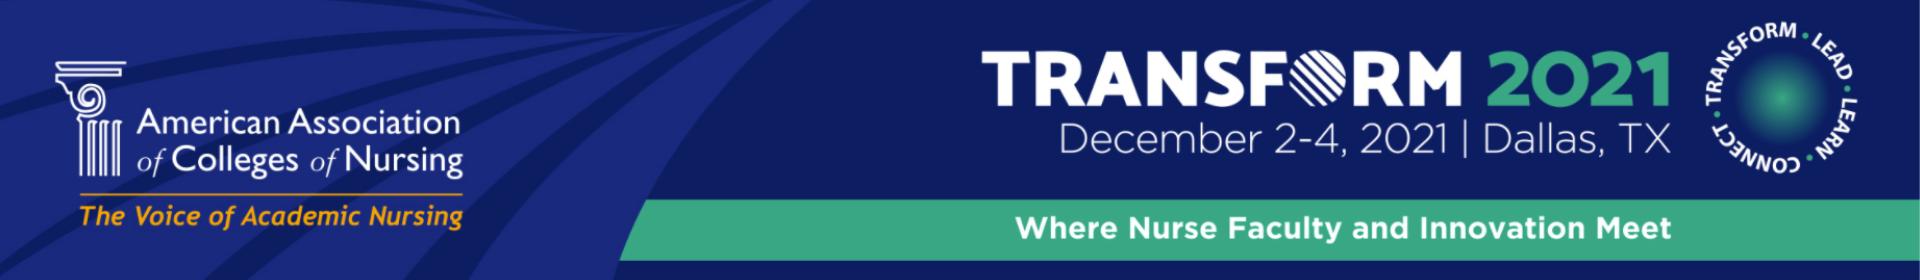 Transform 2021 Event Banner